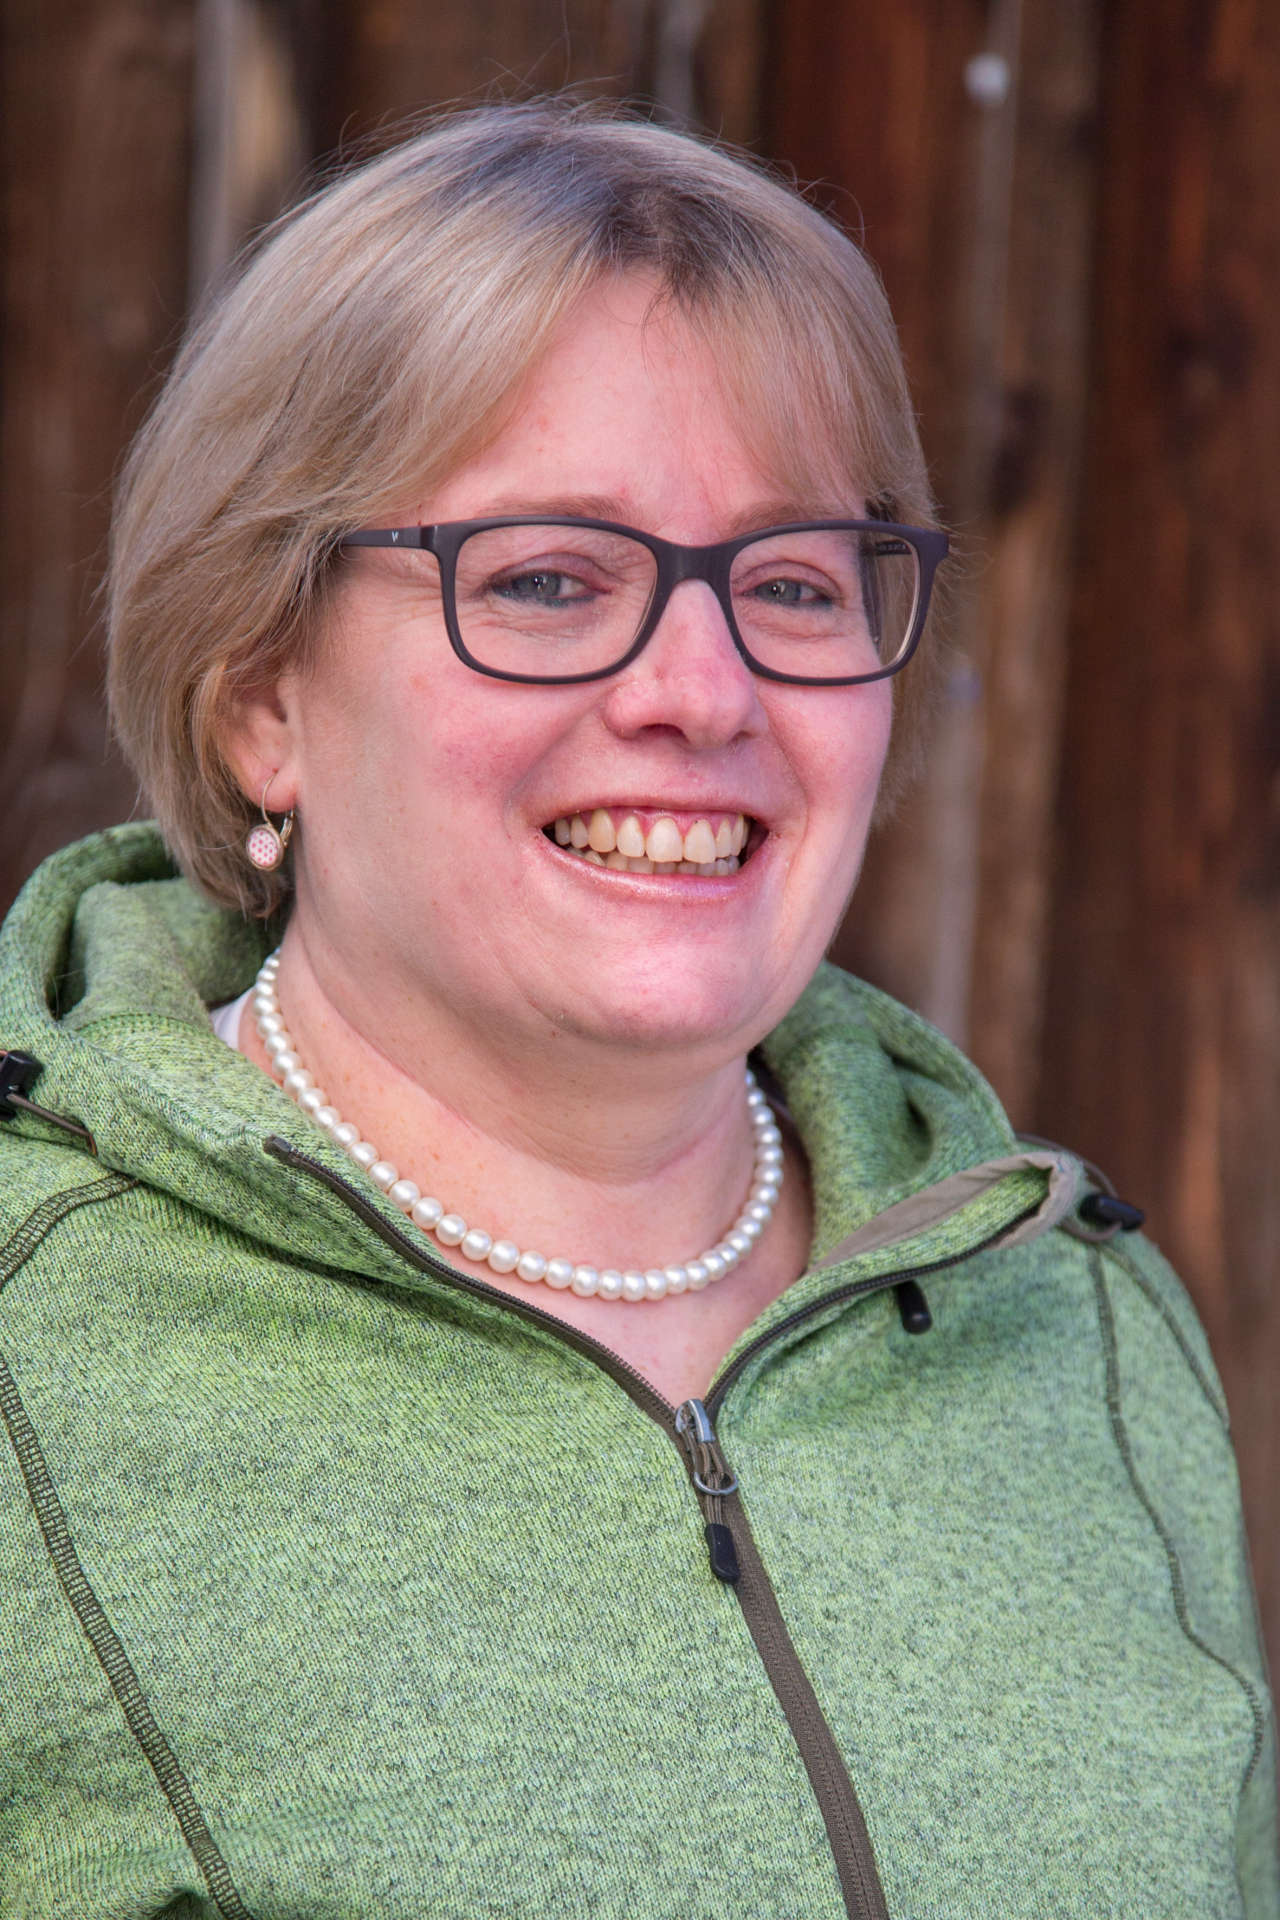 Claudia Böhmer